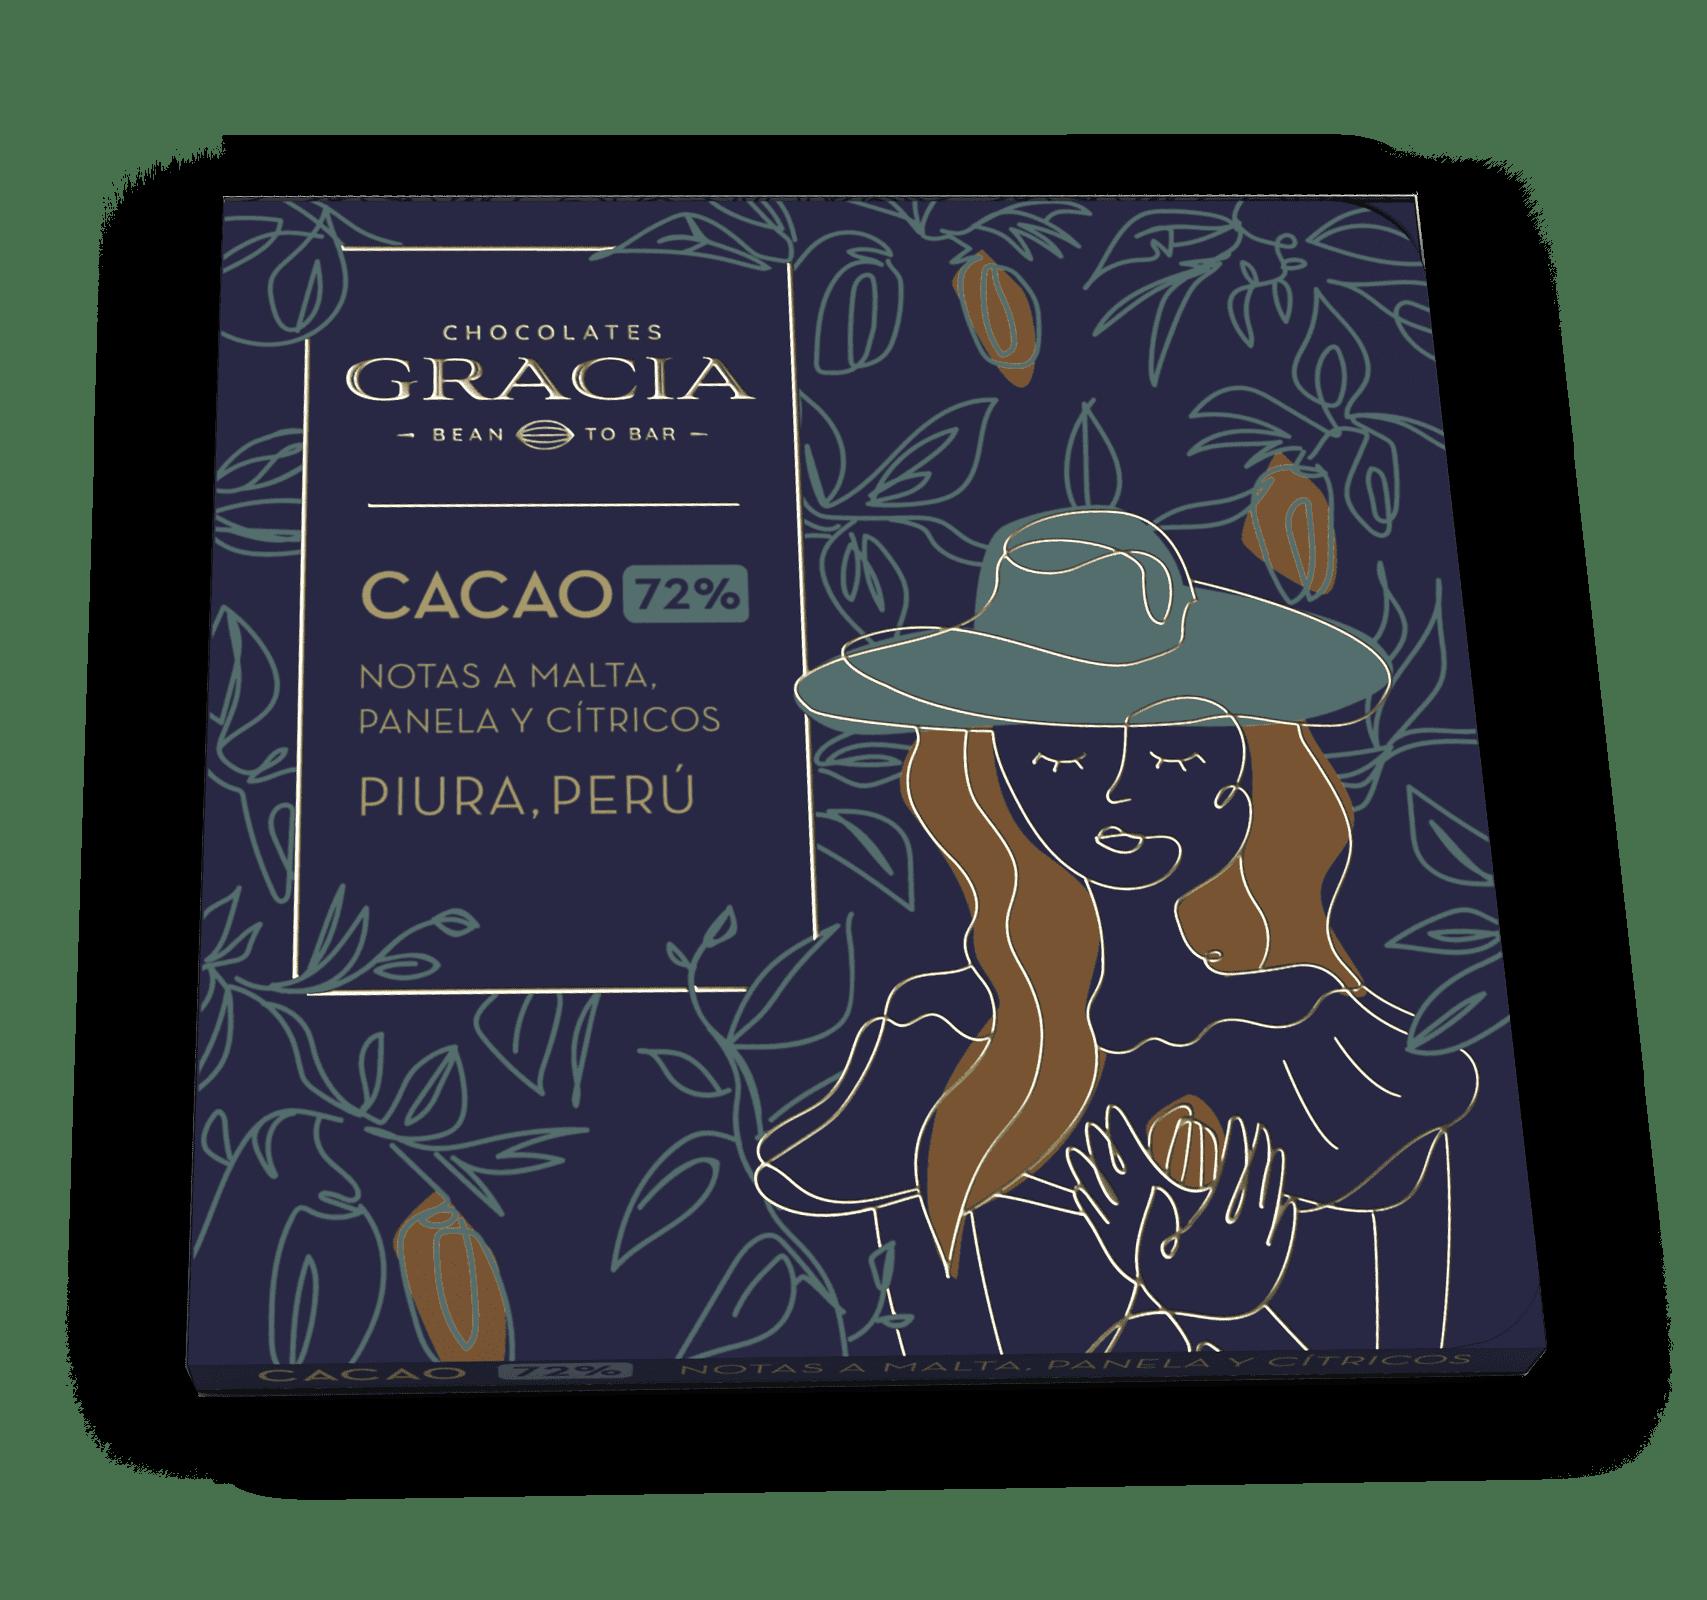 Barra 72% Cacao - Chocolates Gracia